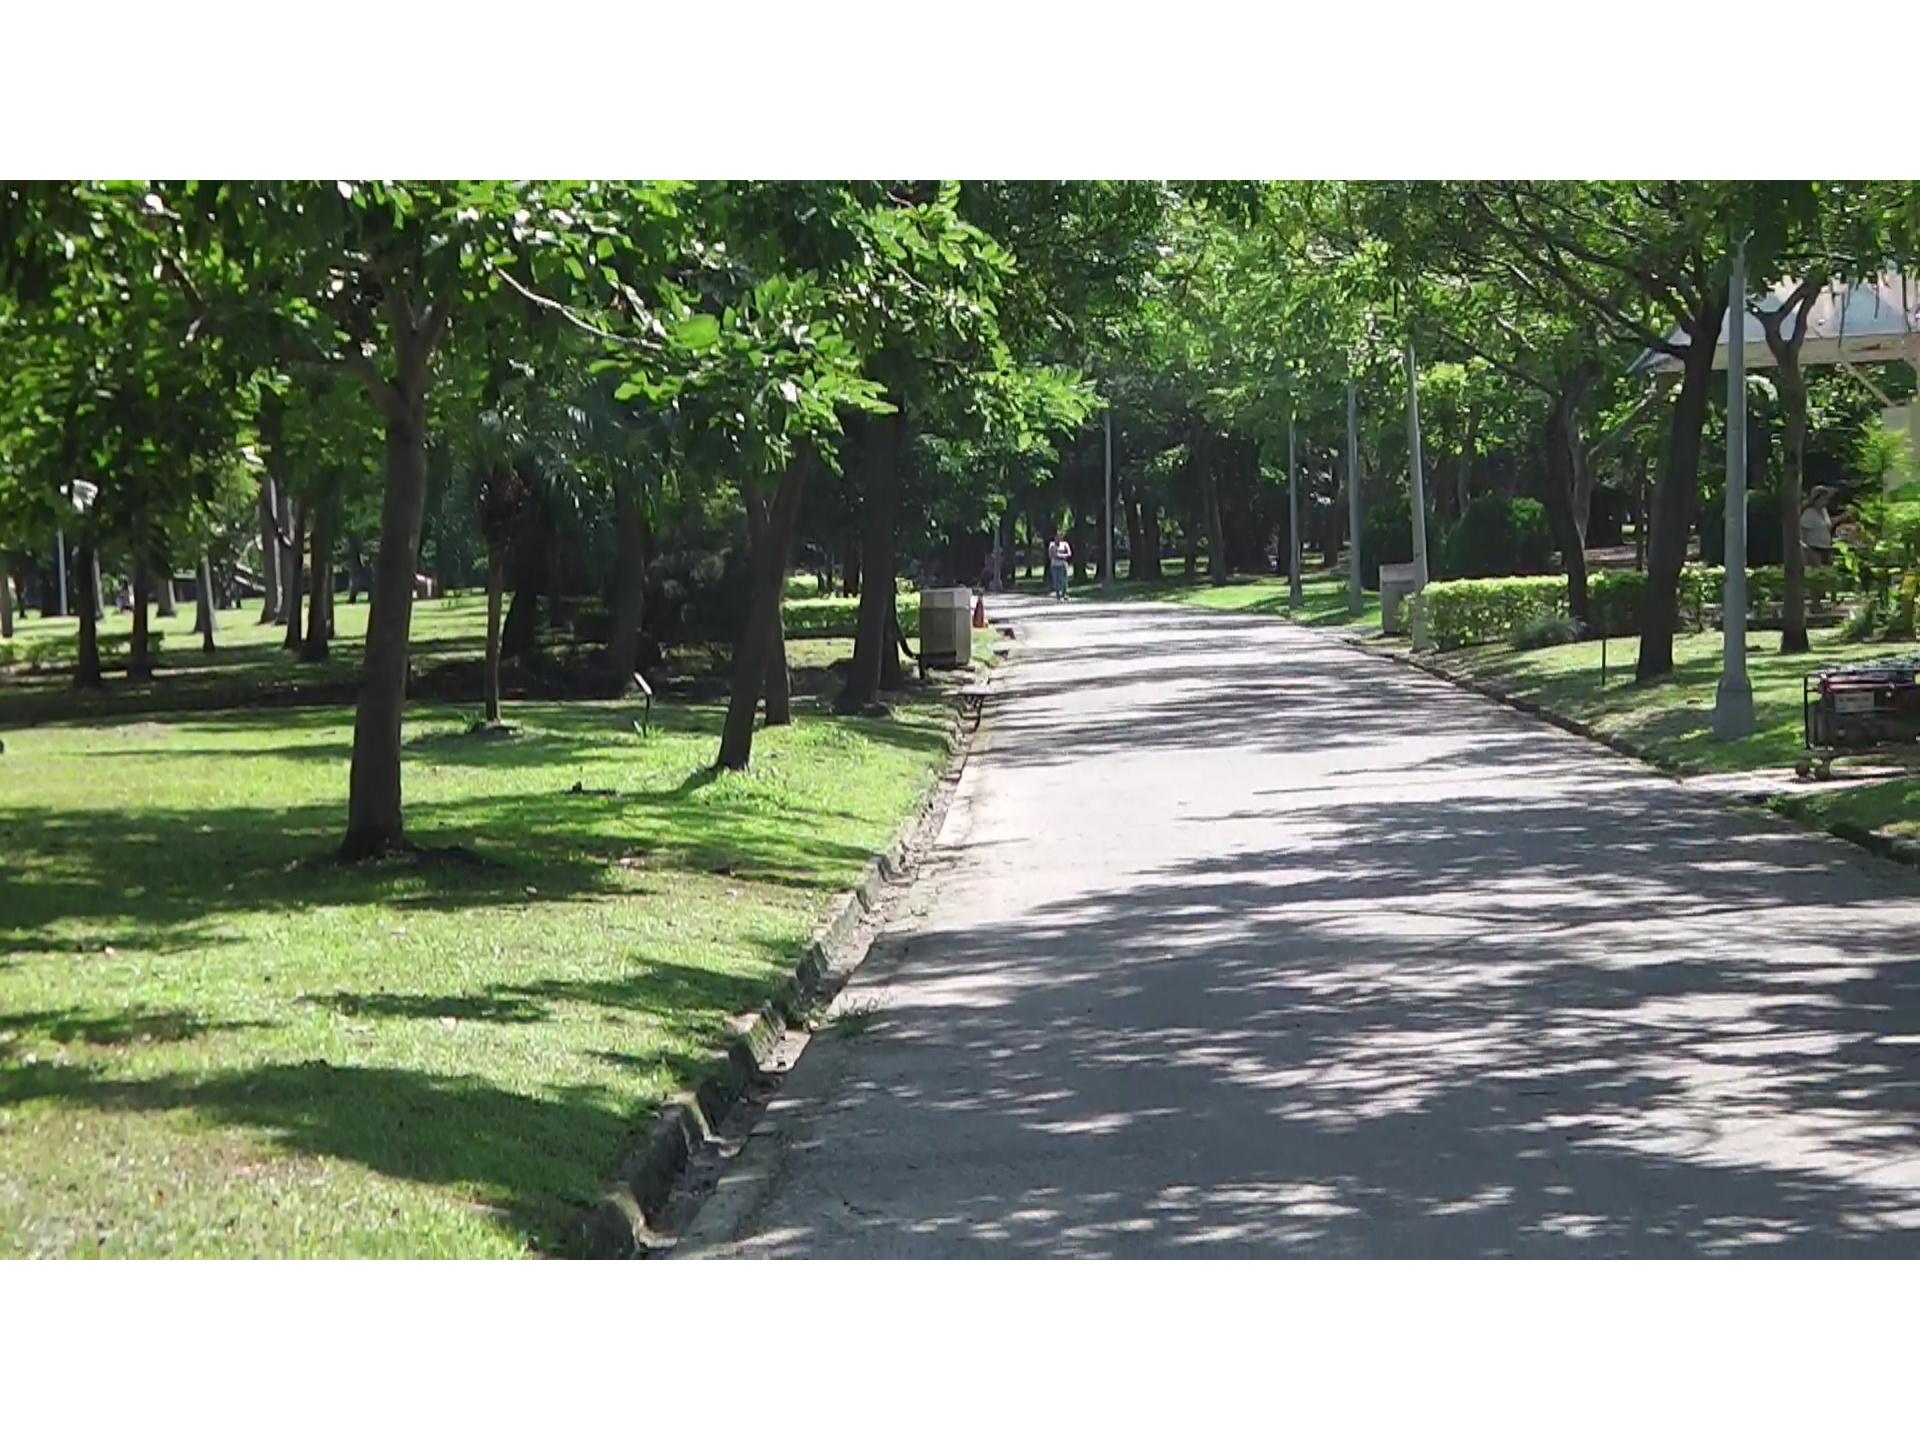 【Taipei】Daan Forest Park